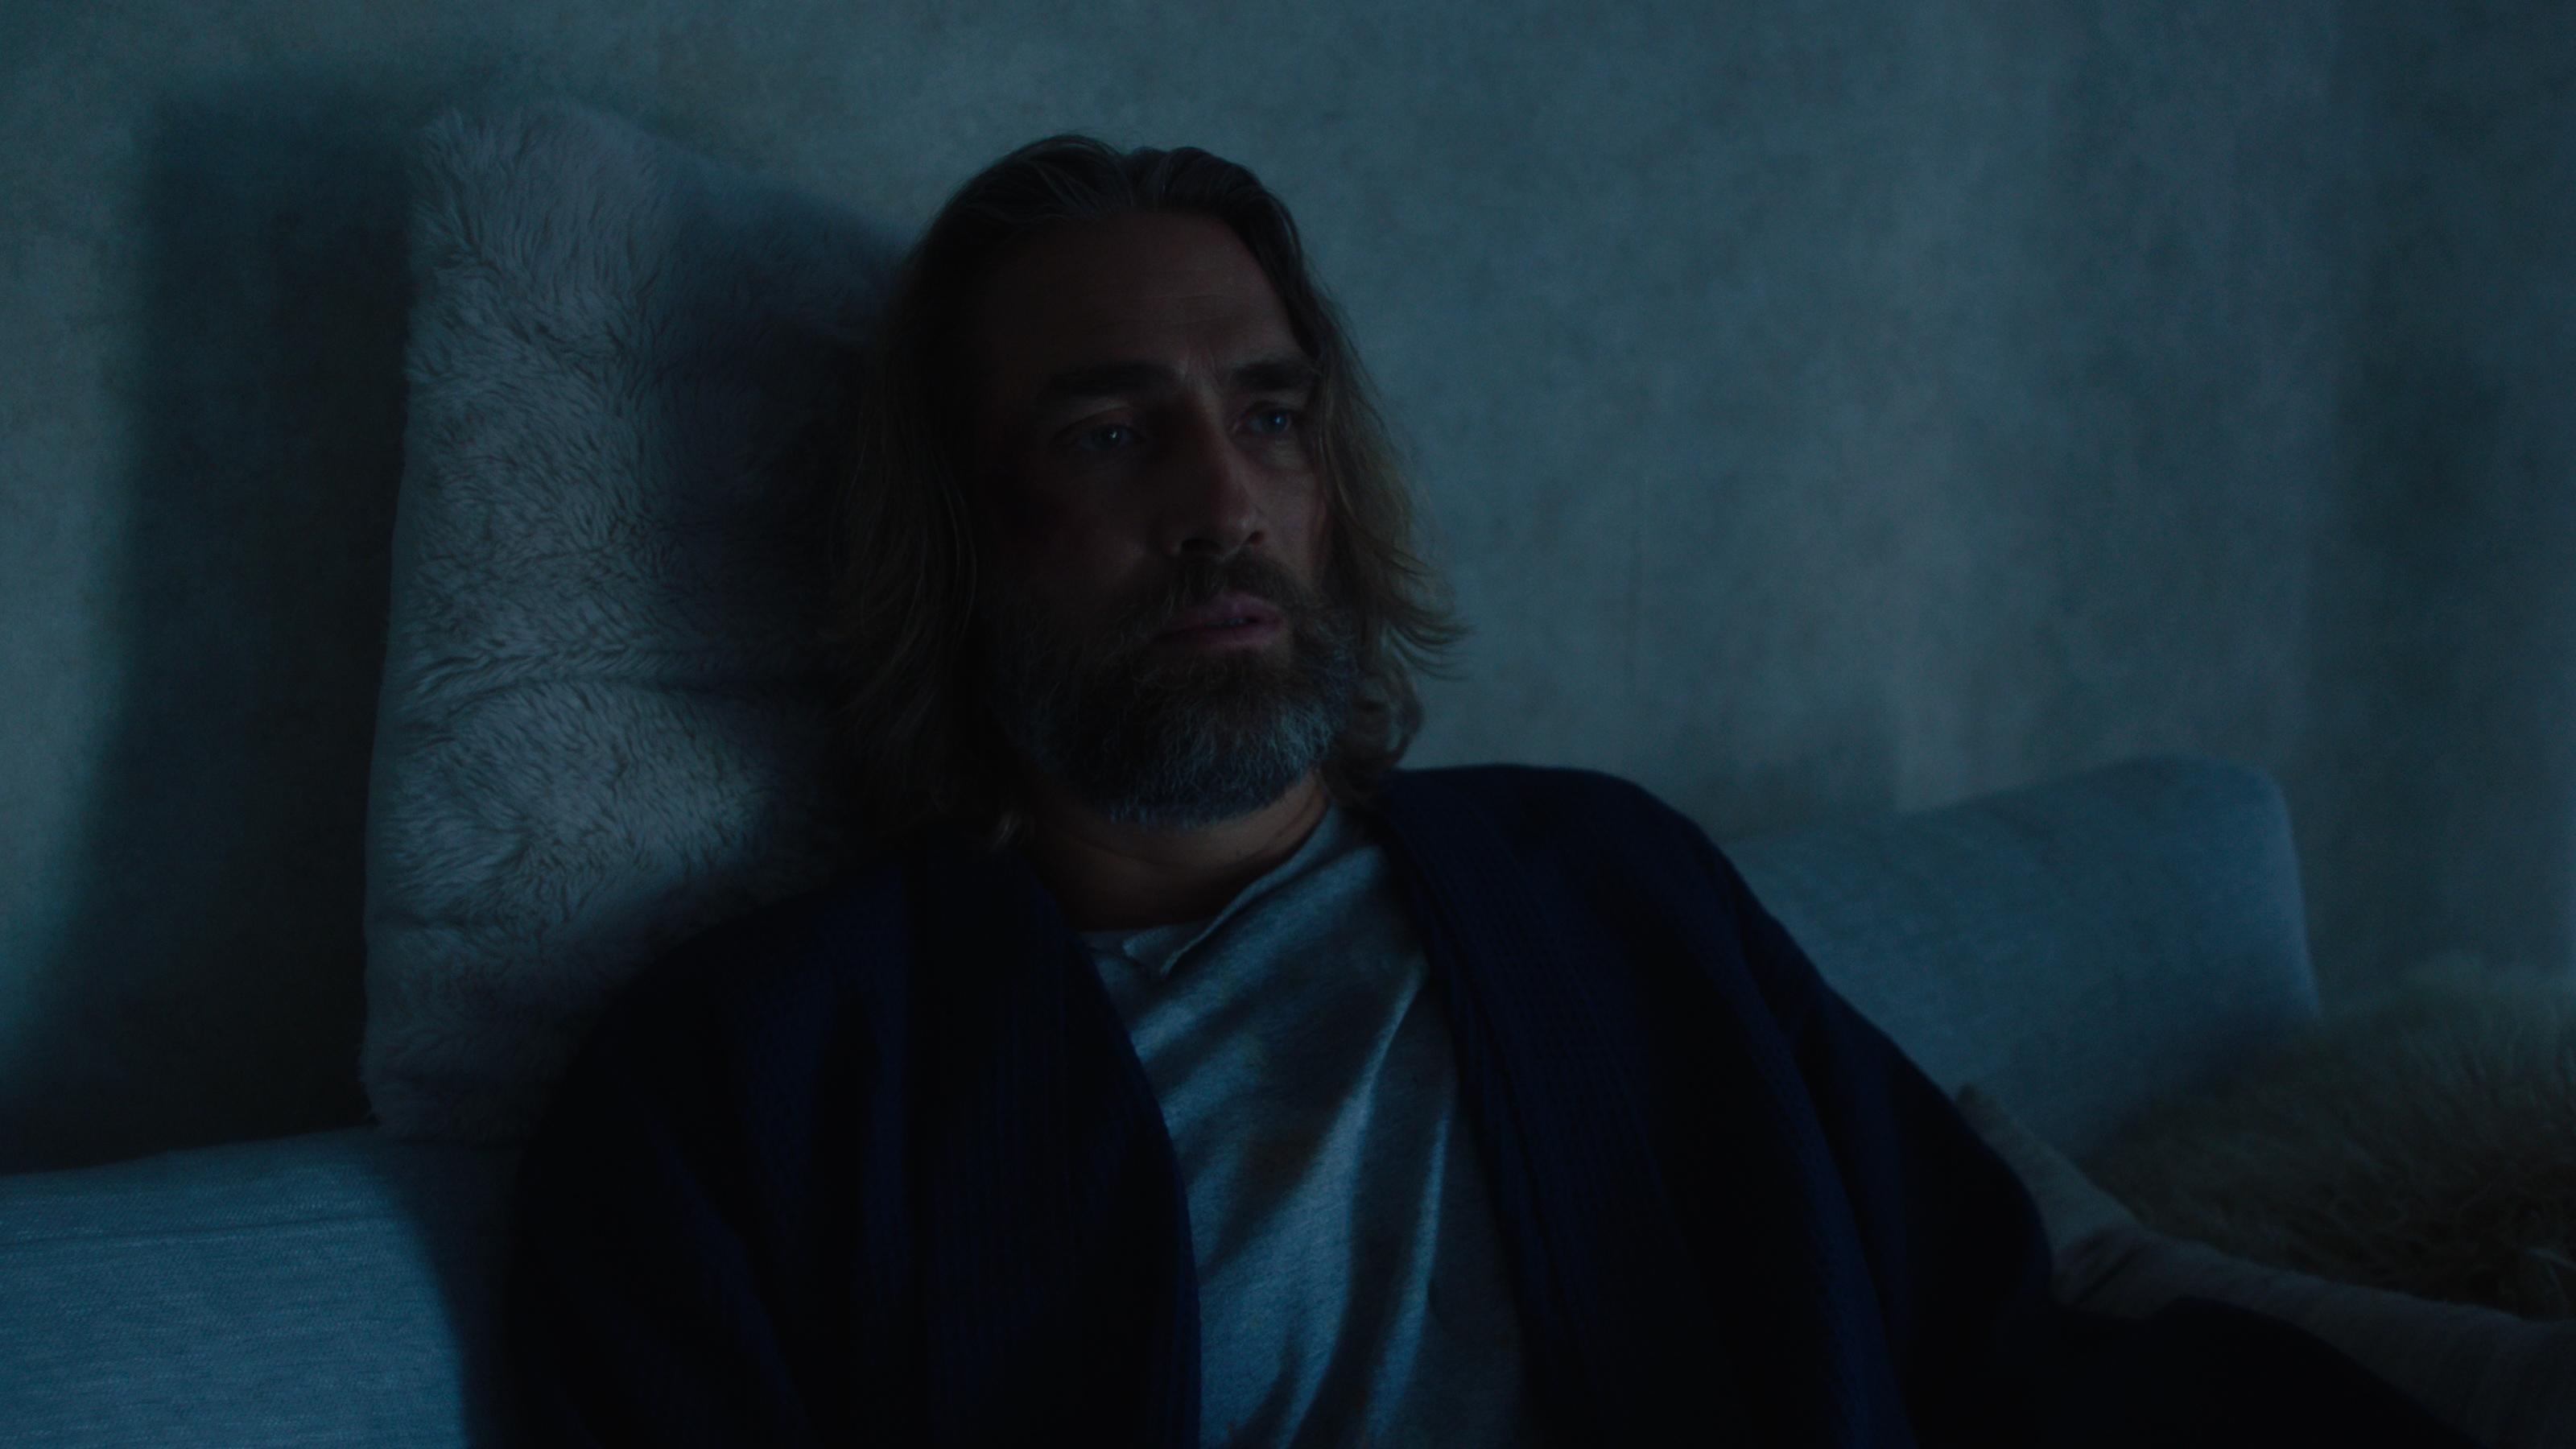 Lukas Hassel in Hermit (2020)